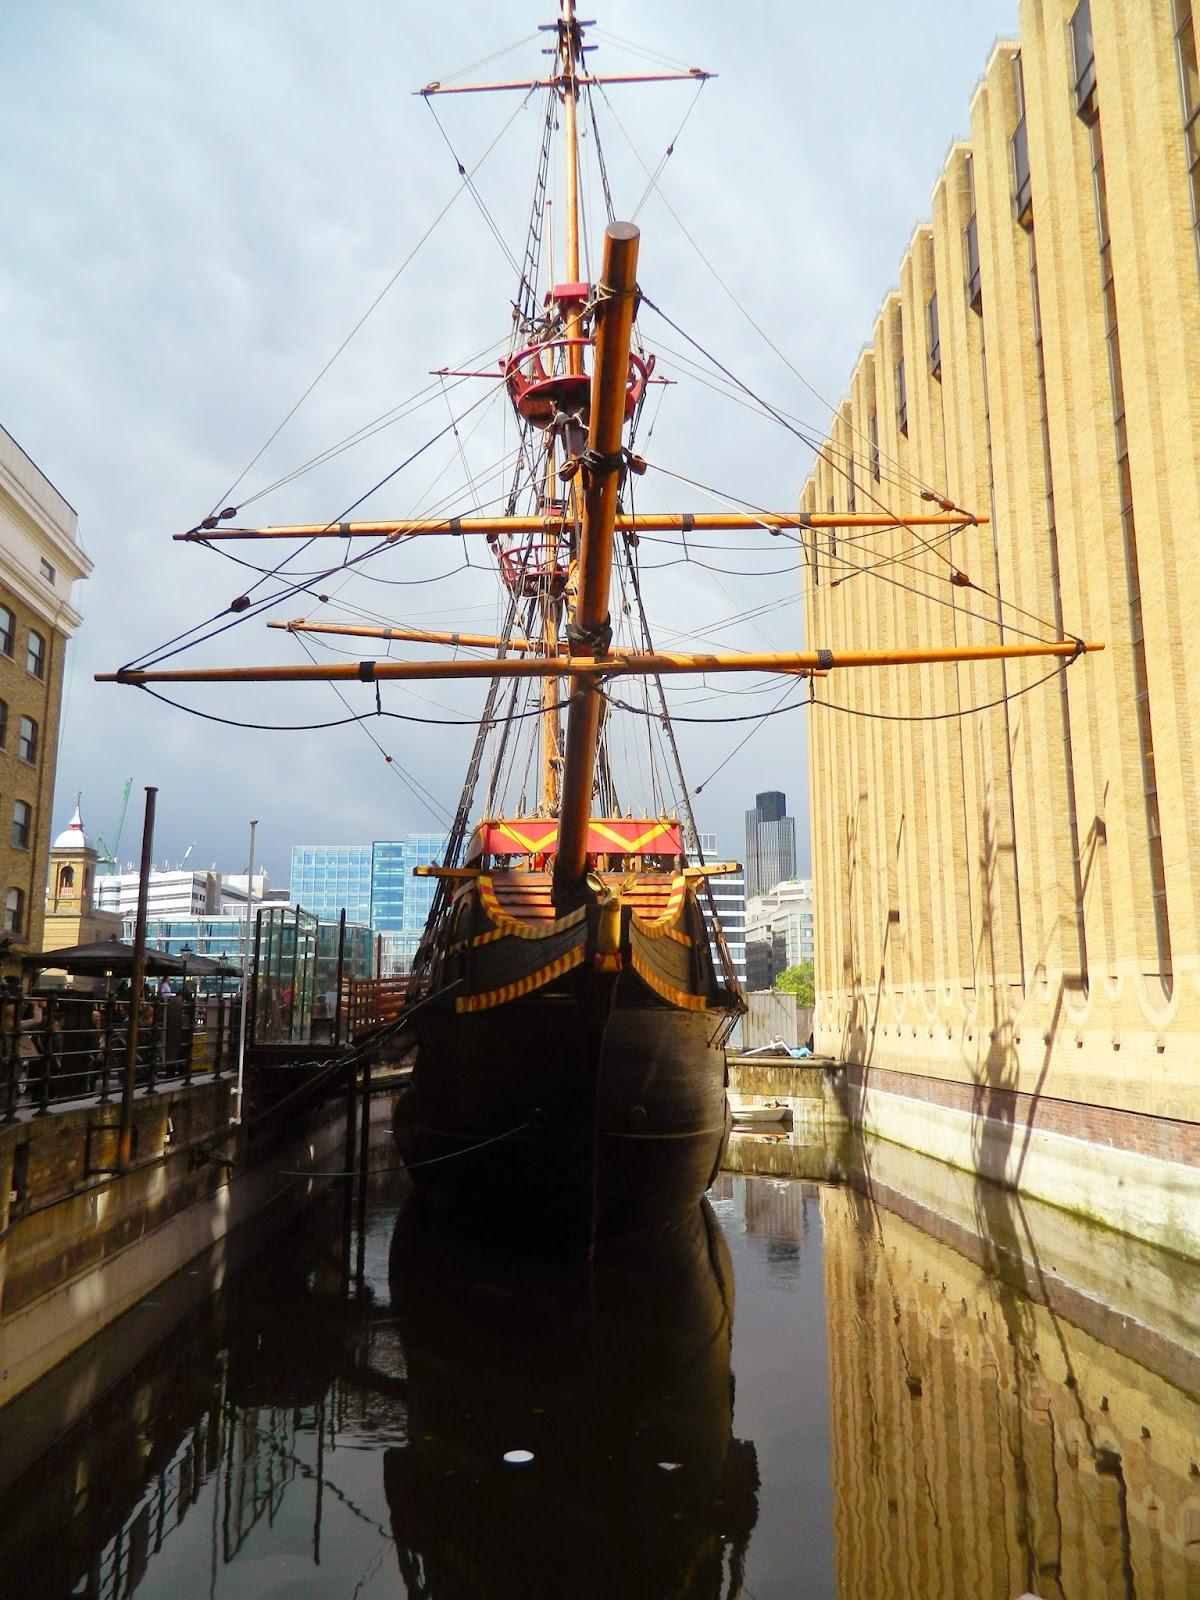 pirate ship london between buildings sails surpass